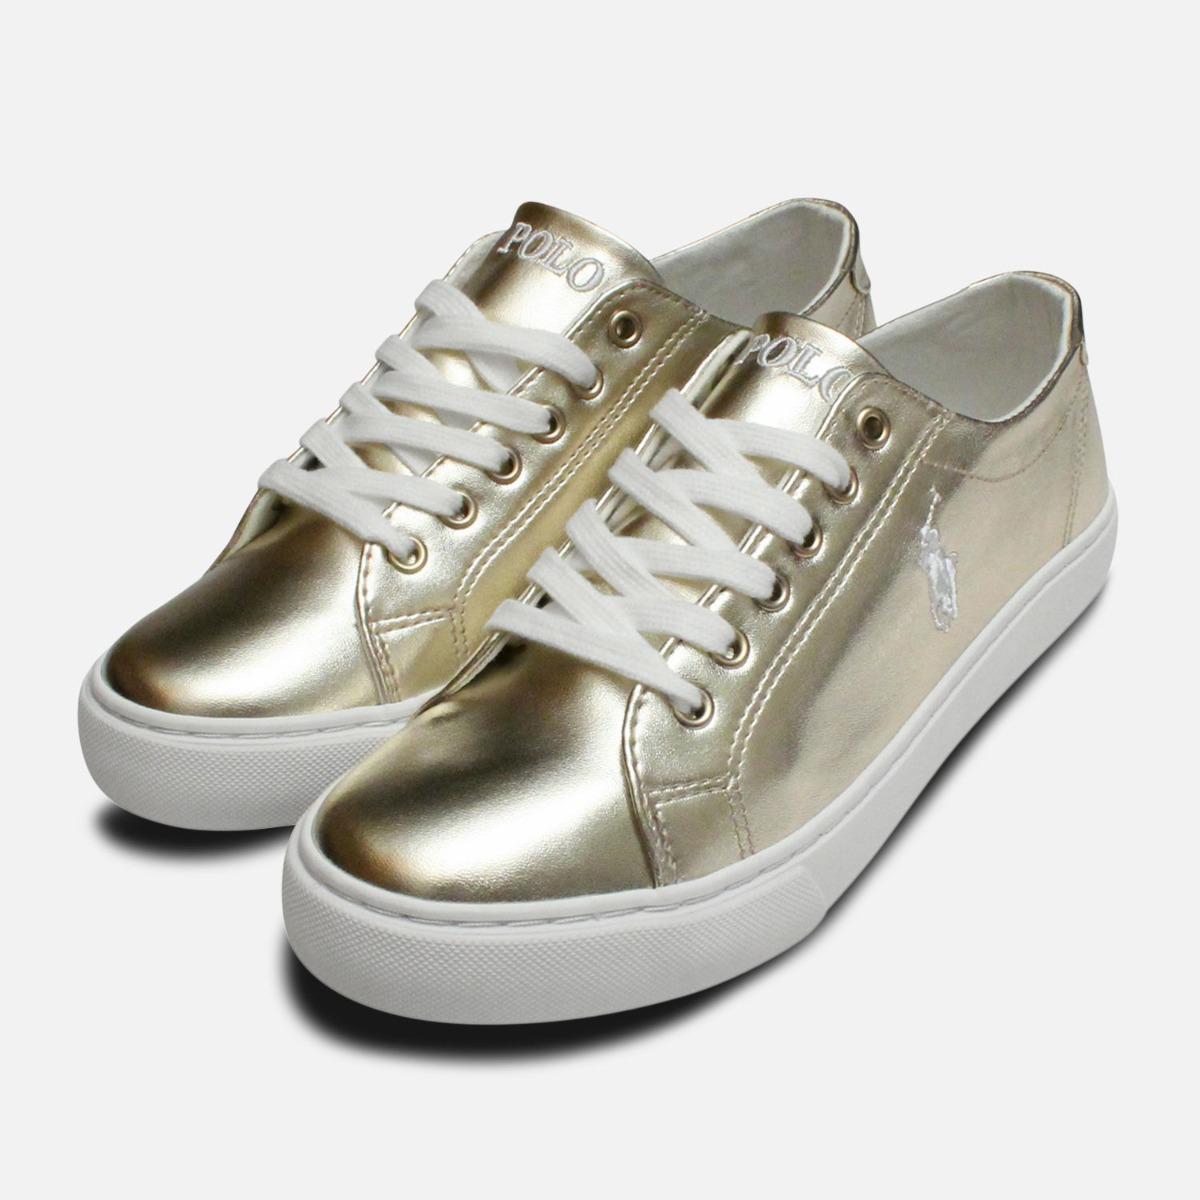 Gold \u0026 White Ralph Lauren Polo Junior